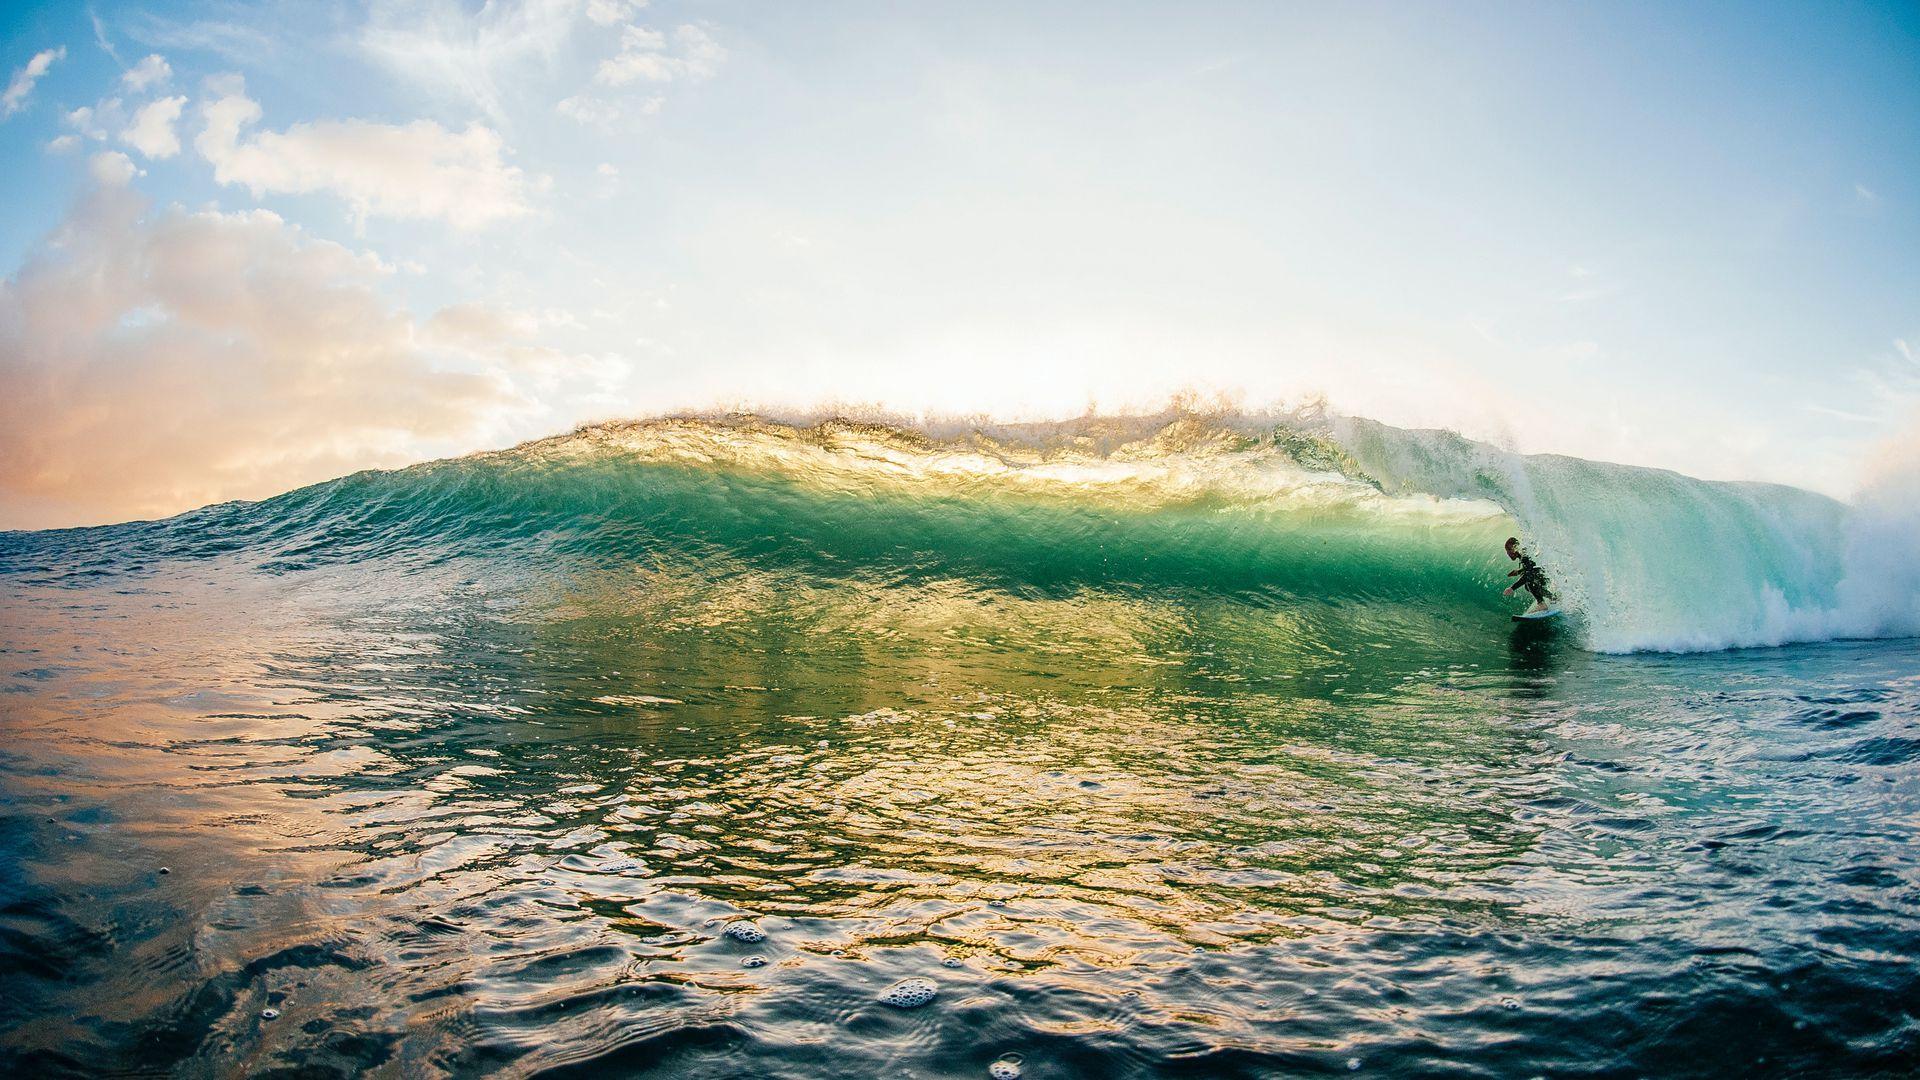 Wallpaper Surfer Sky Ocean Surfing Wave Surfing Waves Nature Images Waves Hd wallpaper surfer wave ocean sky